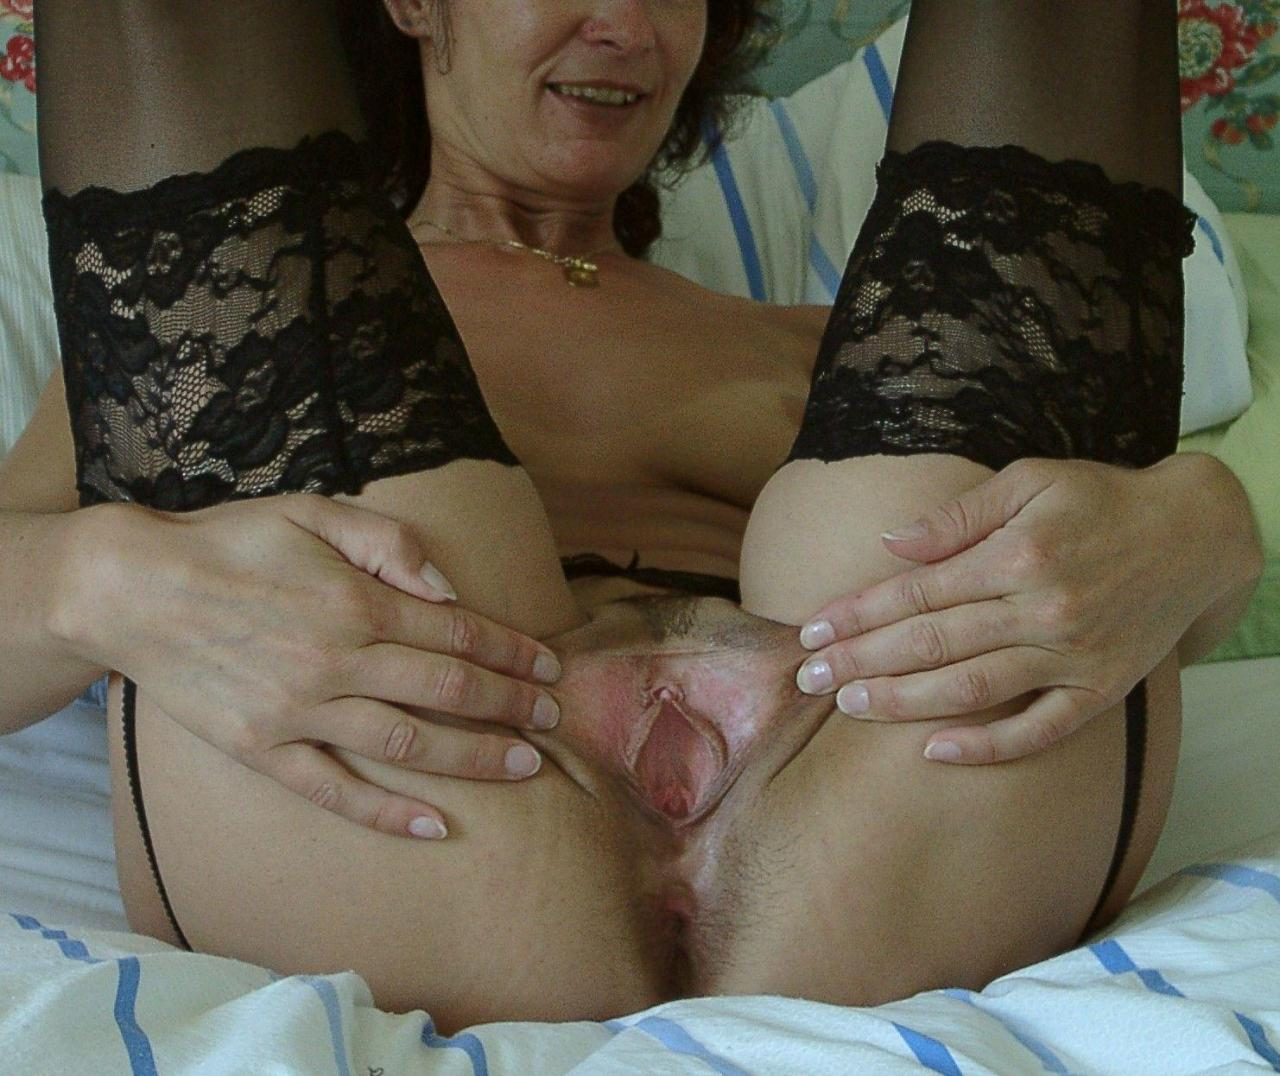 razvratnaya-mama-porno-video